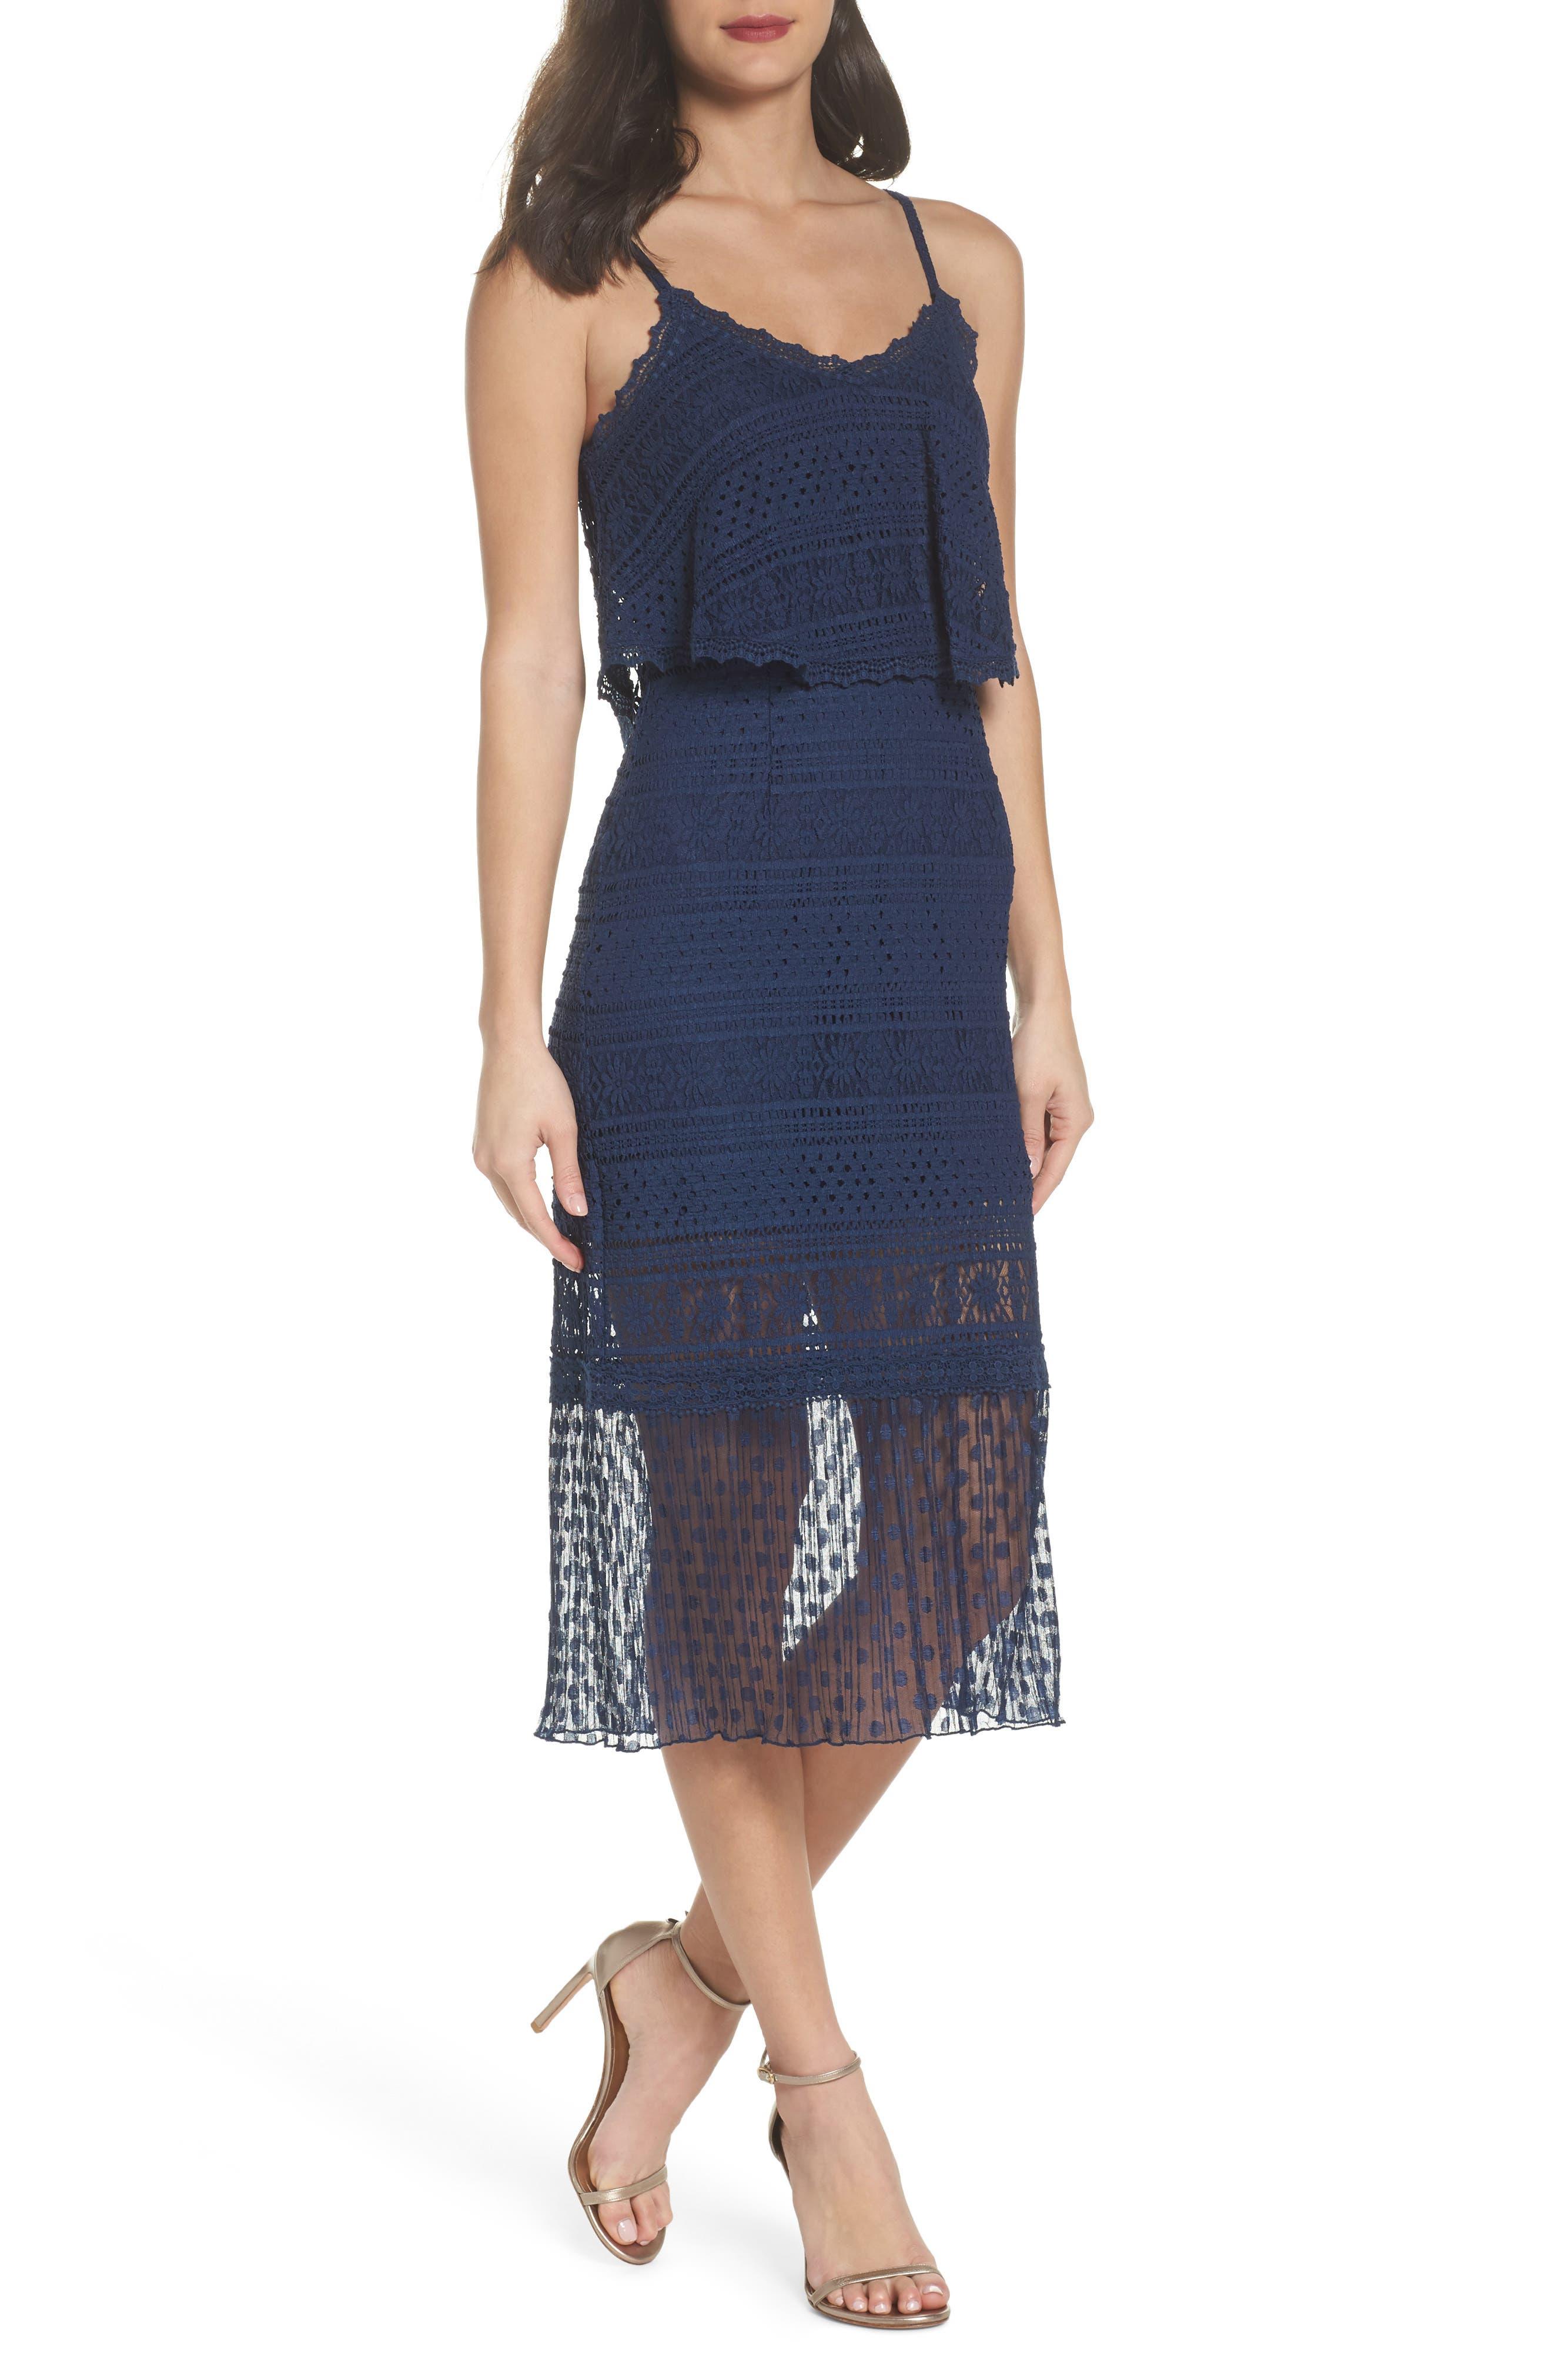 Ellie Lace Midi Dress,                             Main thumbnail 1, color,                             414